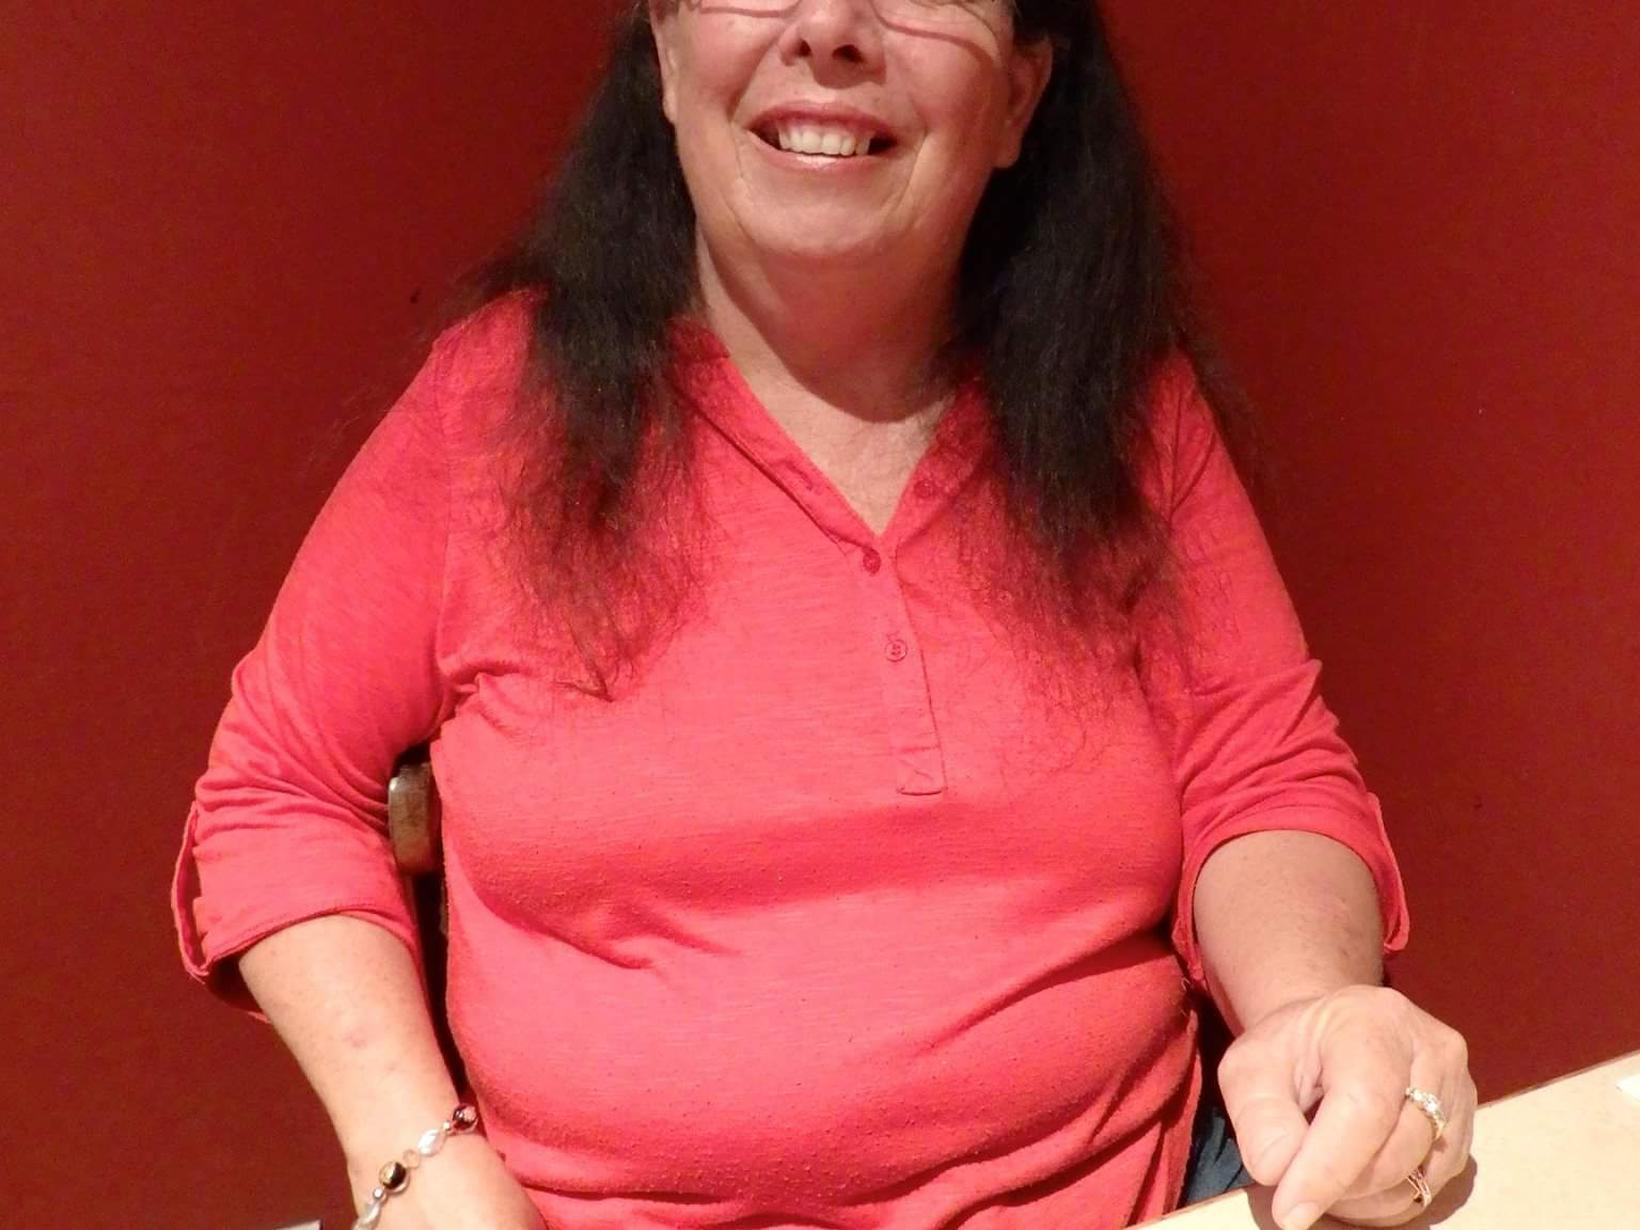 Karen from Brisbane, Queensland, Australia